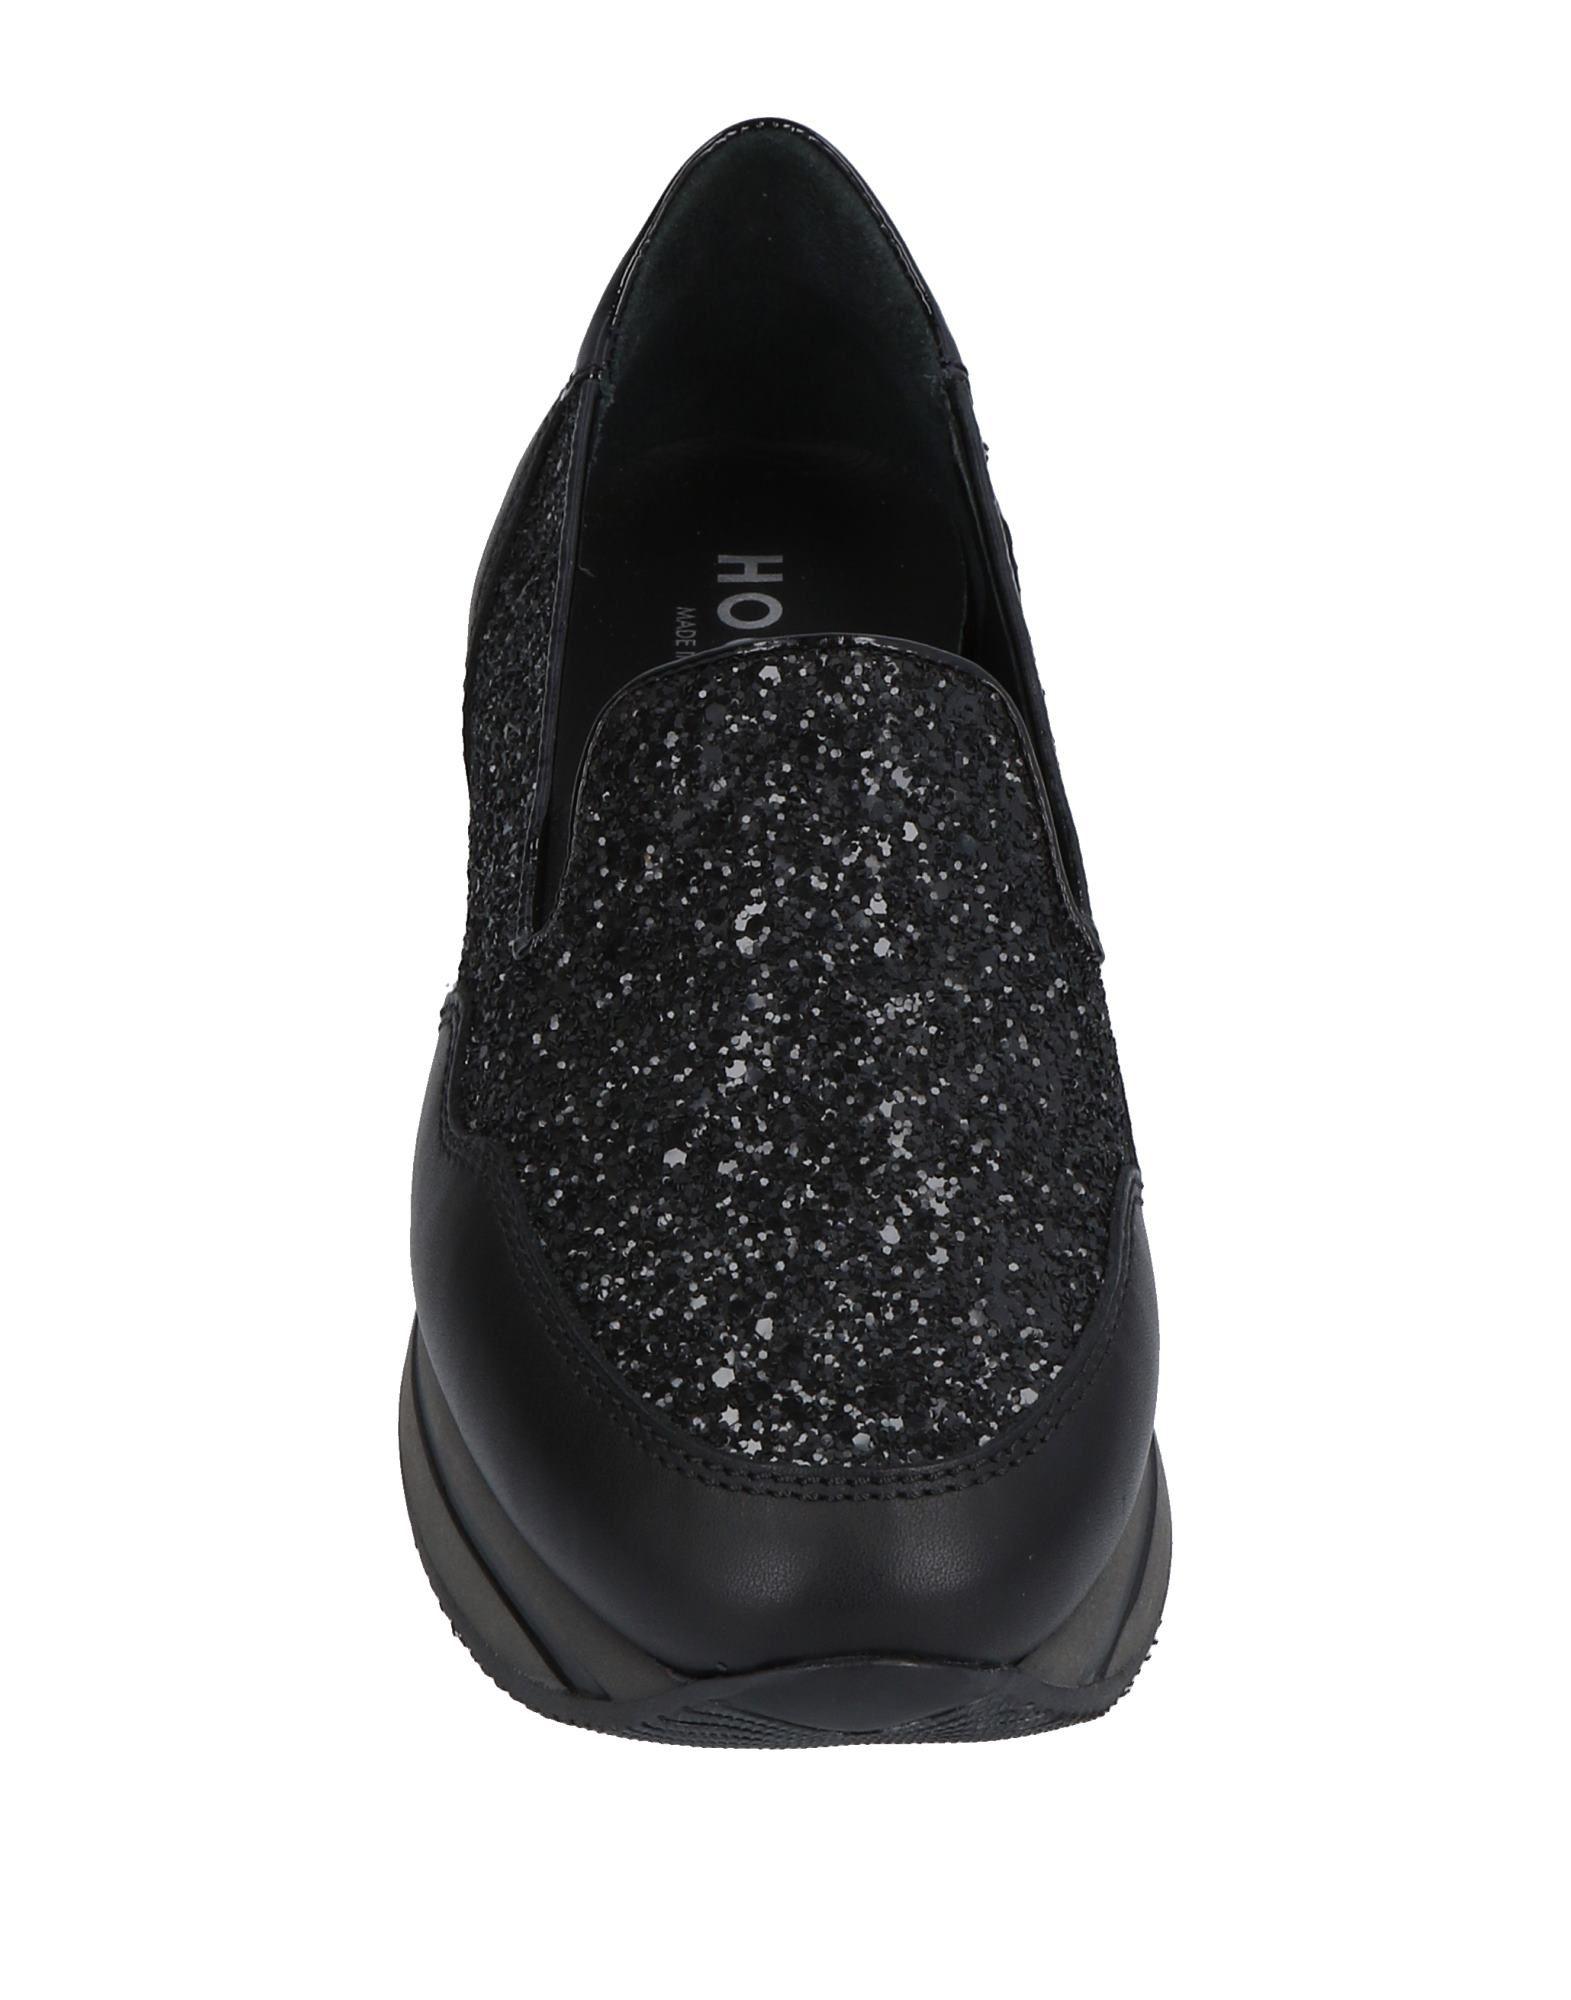 Hogan Mokassins Damen   11500221RO Heiße Schuhe abf1aa